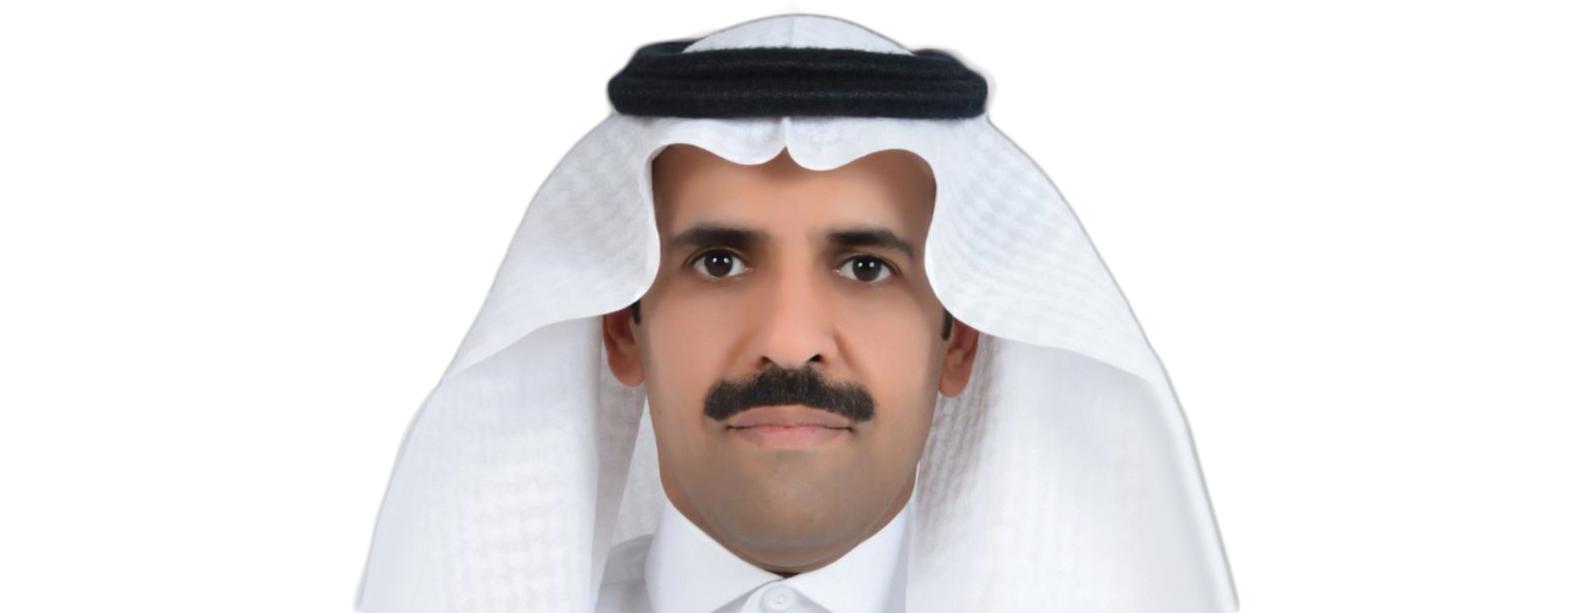 محمد بن طامي